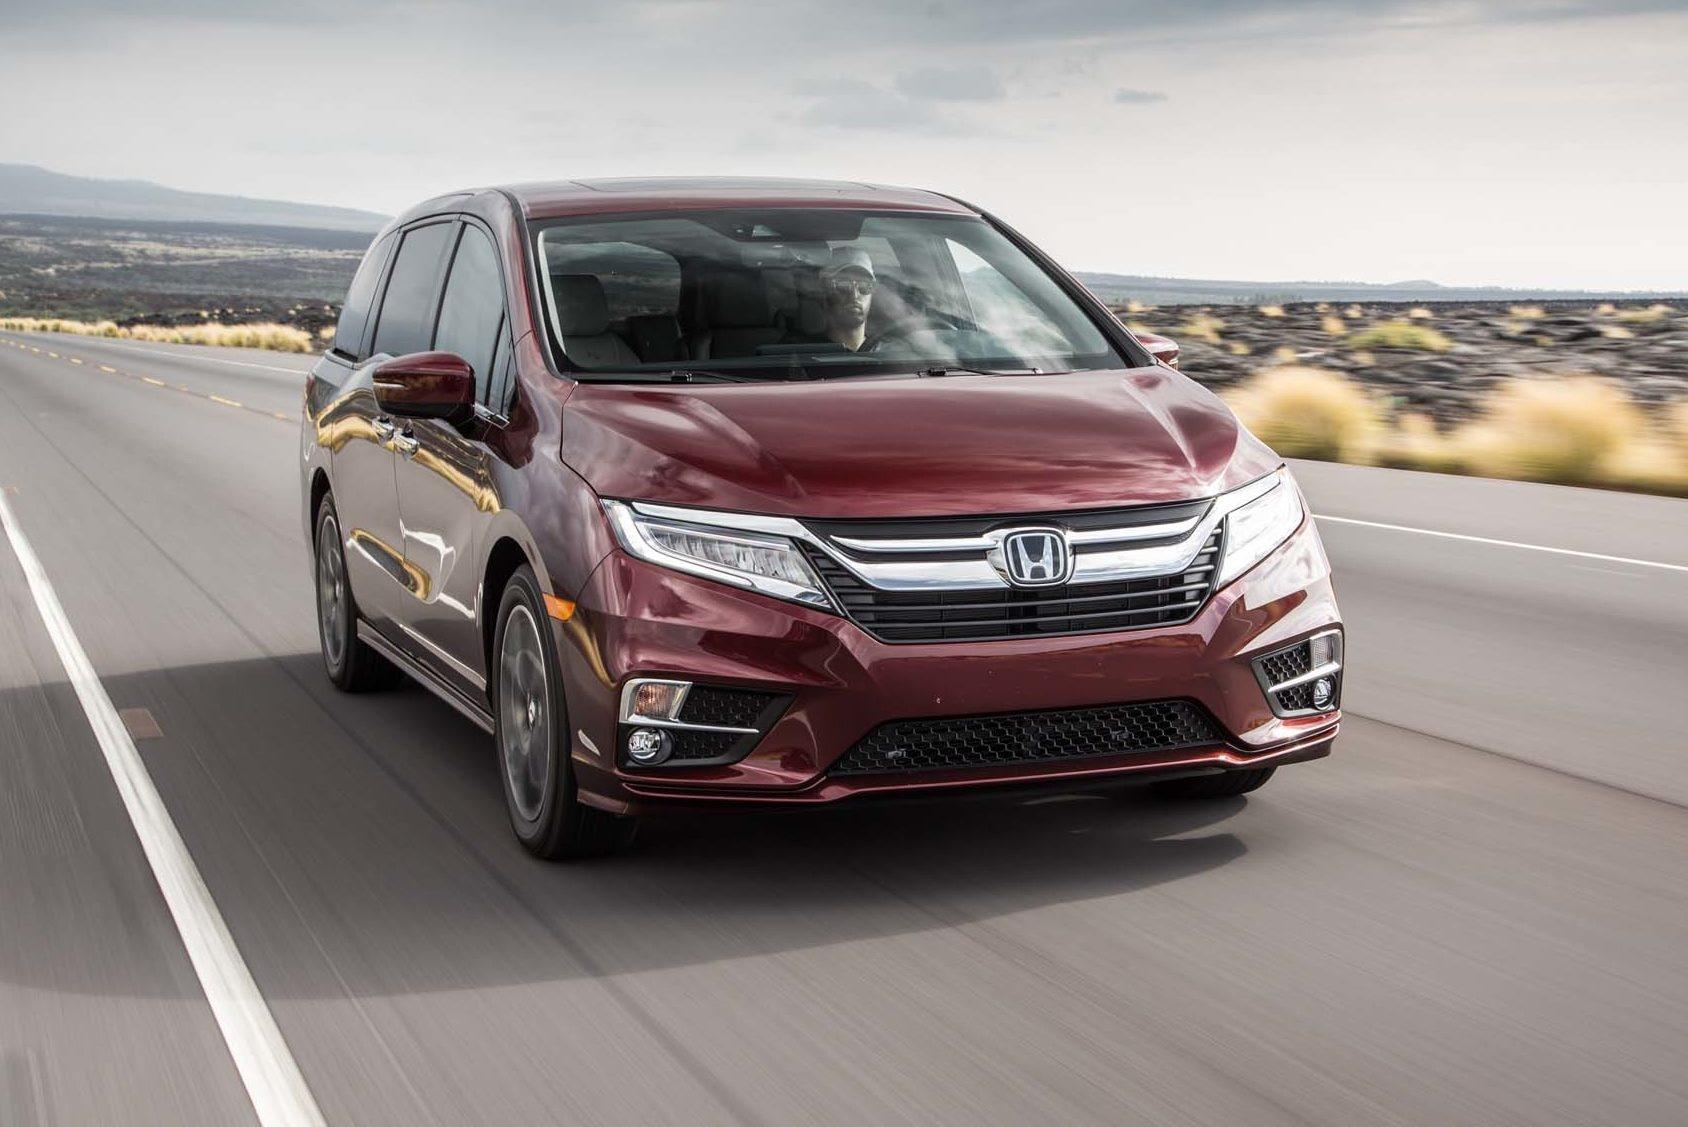 2018 Honda Odyssey Front Three Quarter In Motion 02 1 E1501521094384